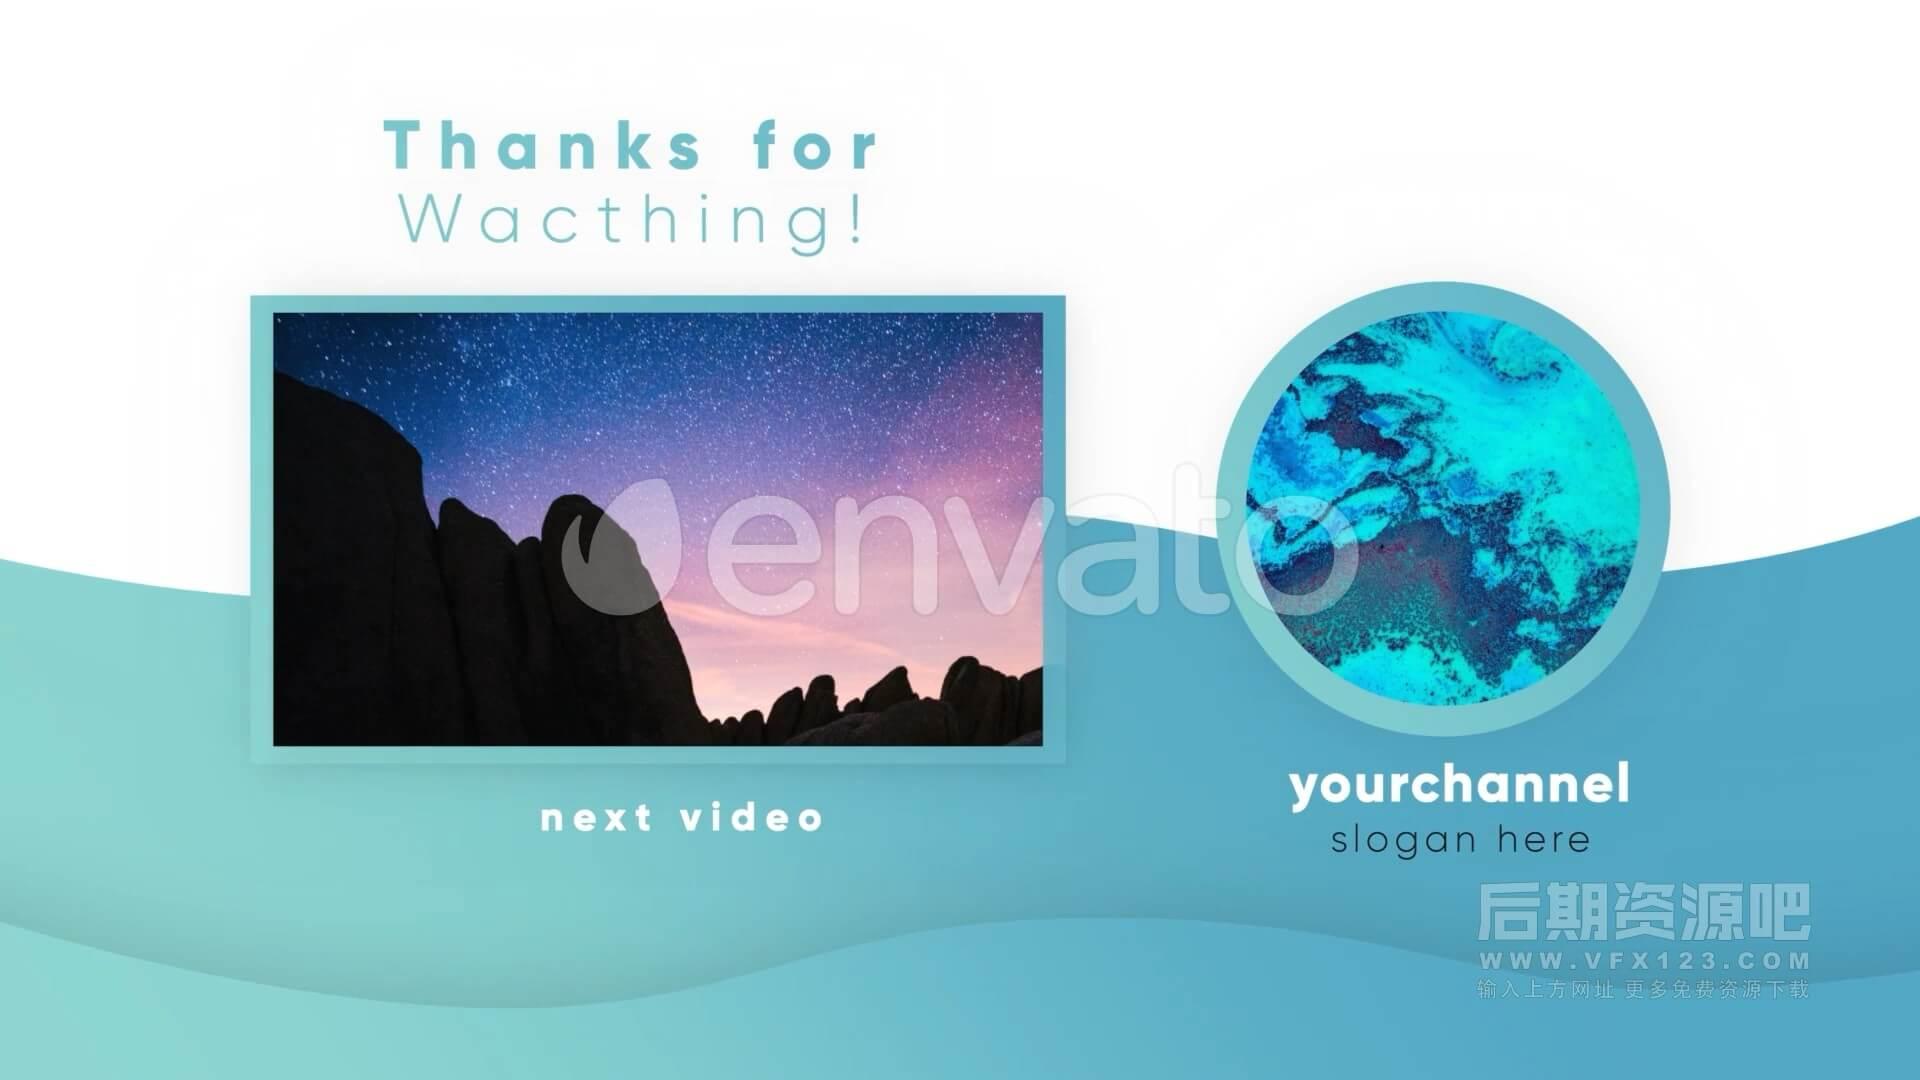 fcpx插件 短视频UP博主下节预告带订阅推广模板 Youtube Stylish Endcards